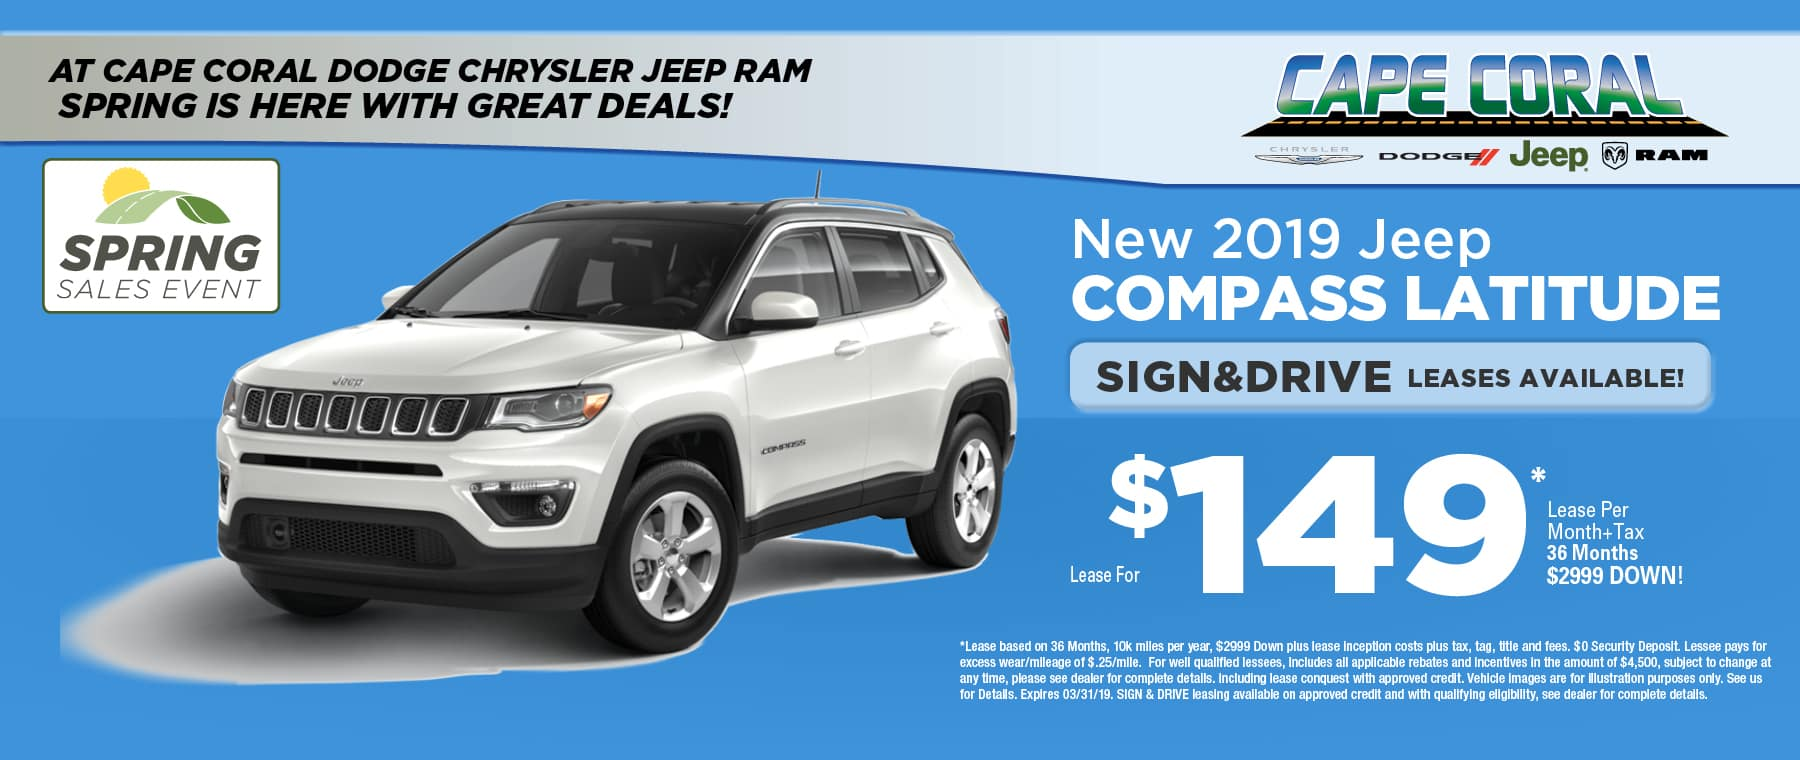 New 2019 Jeep Compass!